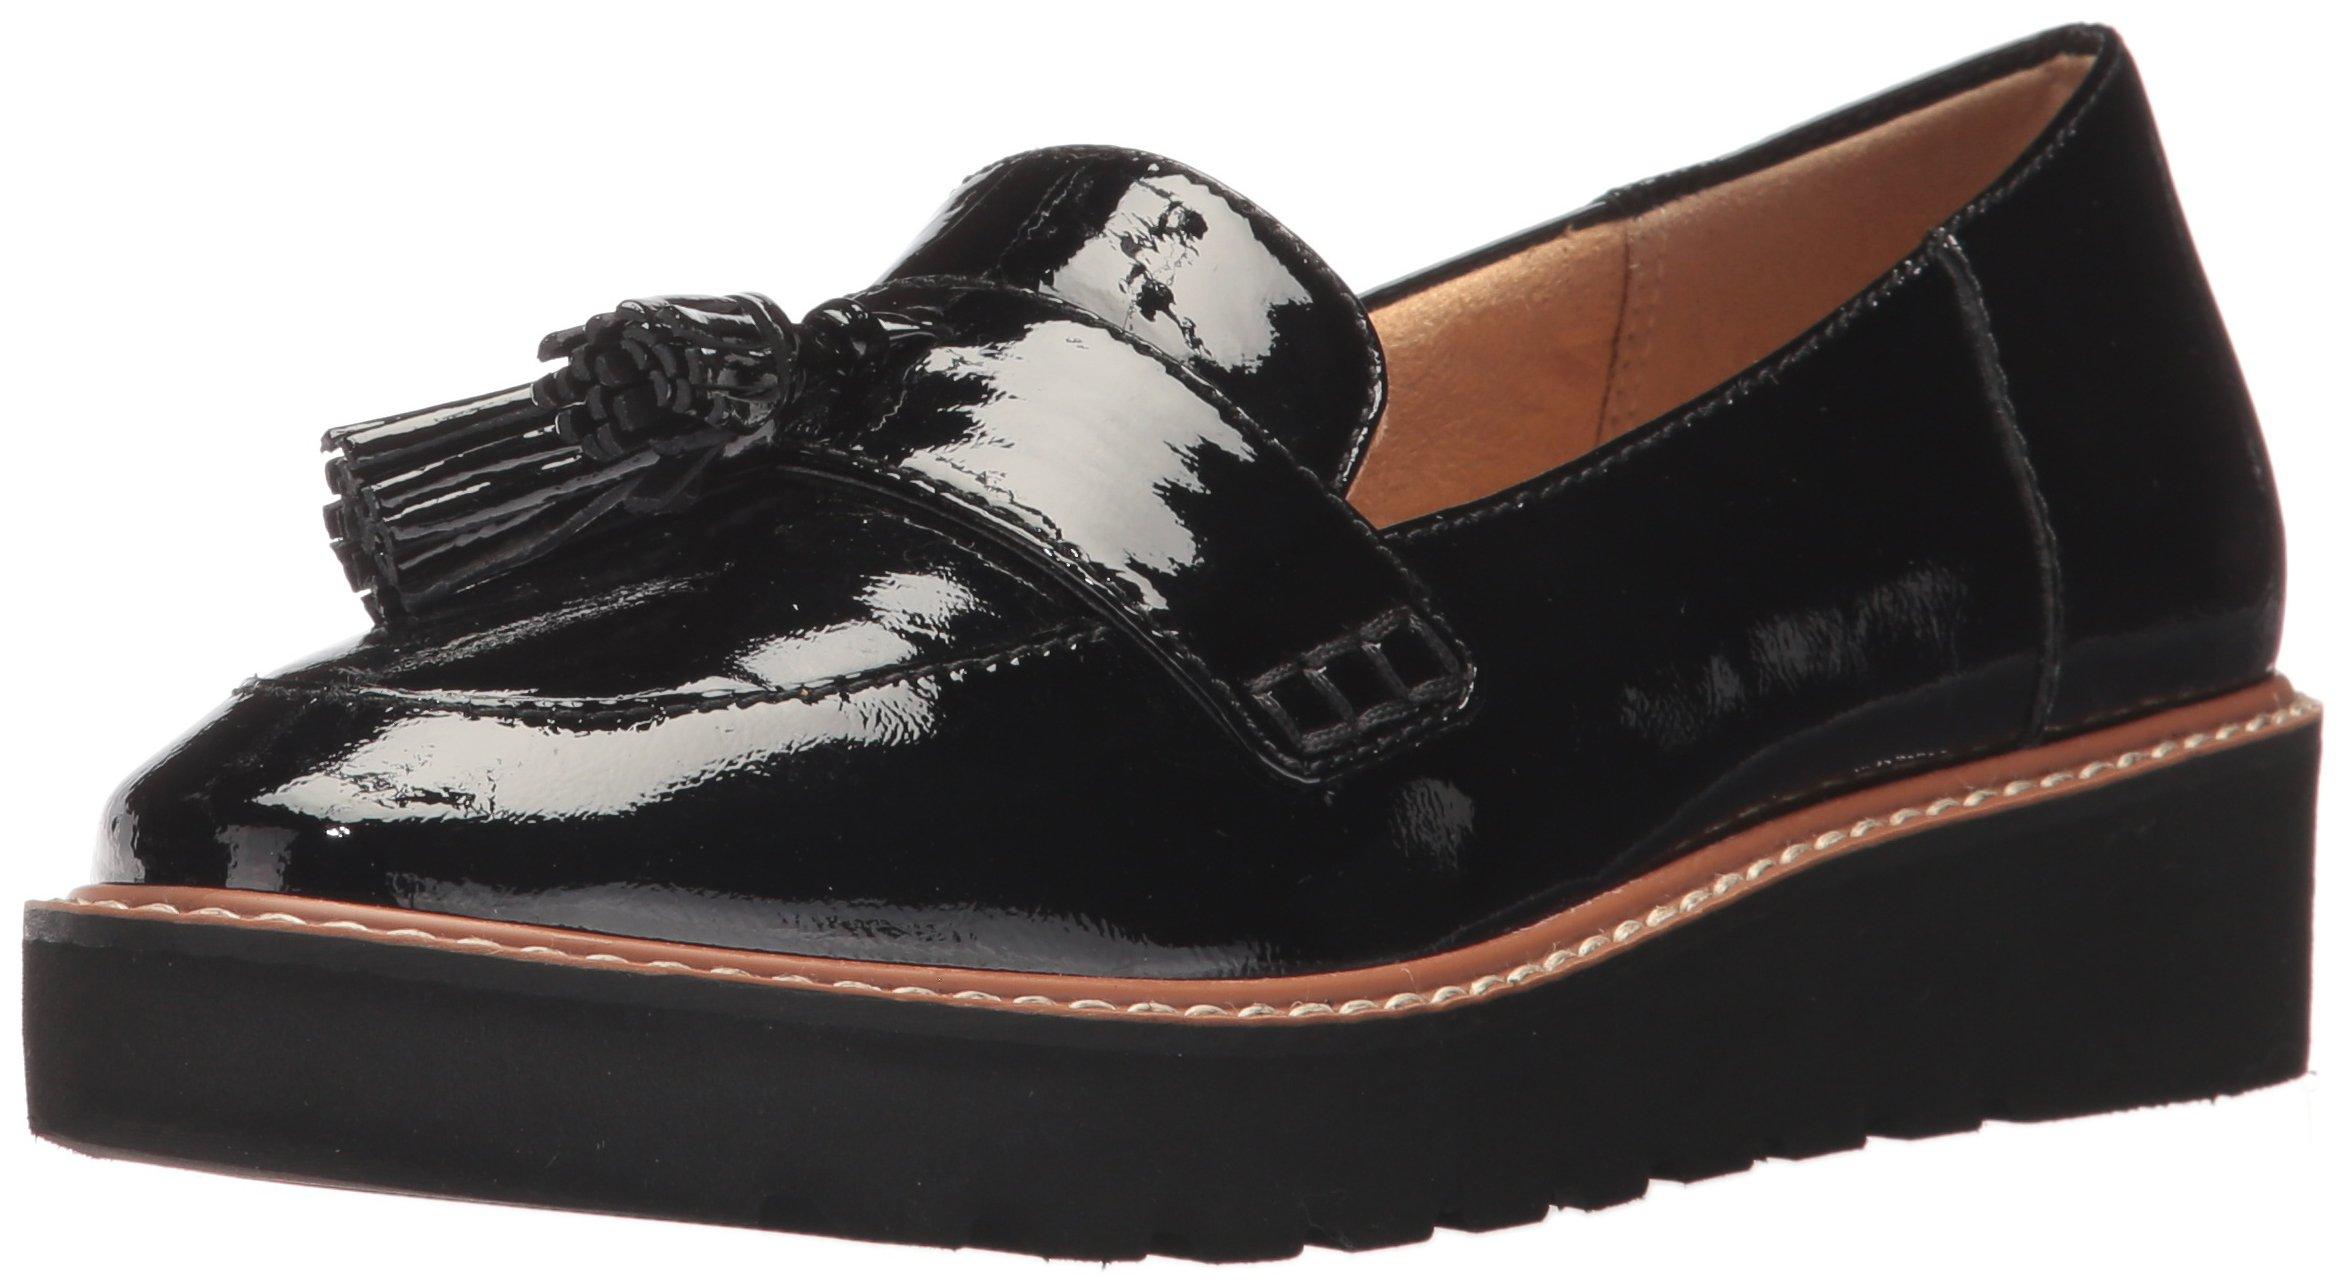 Naturalizer Women's August Slip-on Loafer, Black, 7 W US